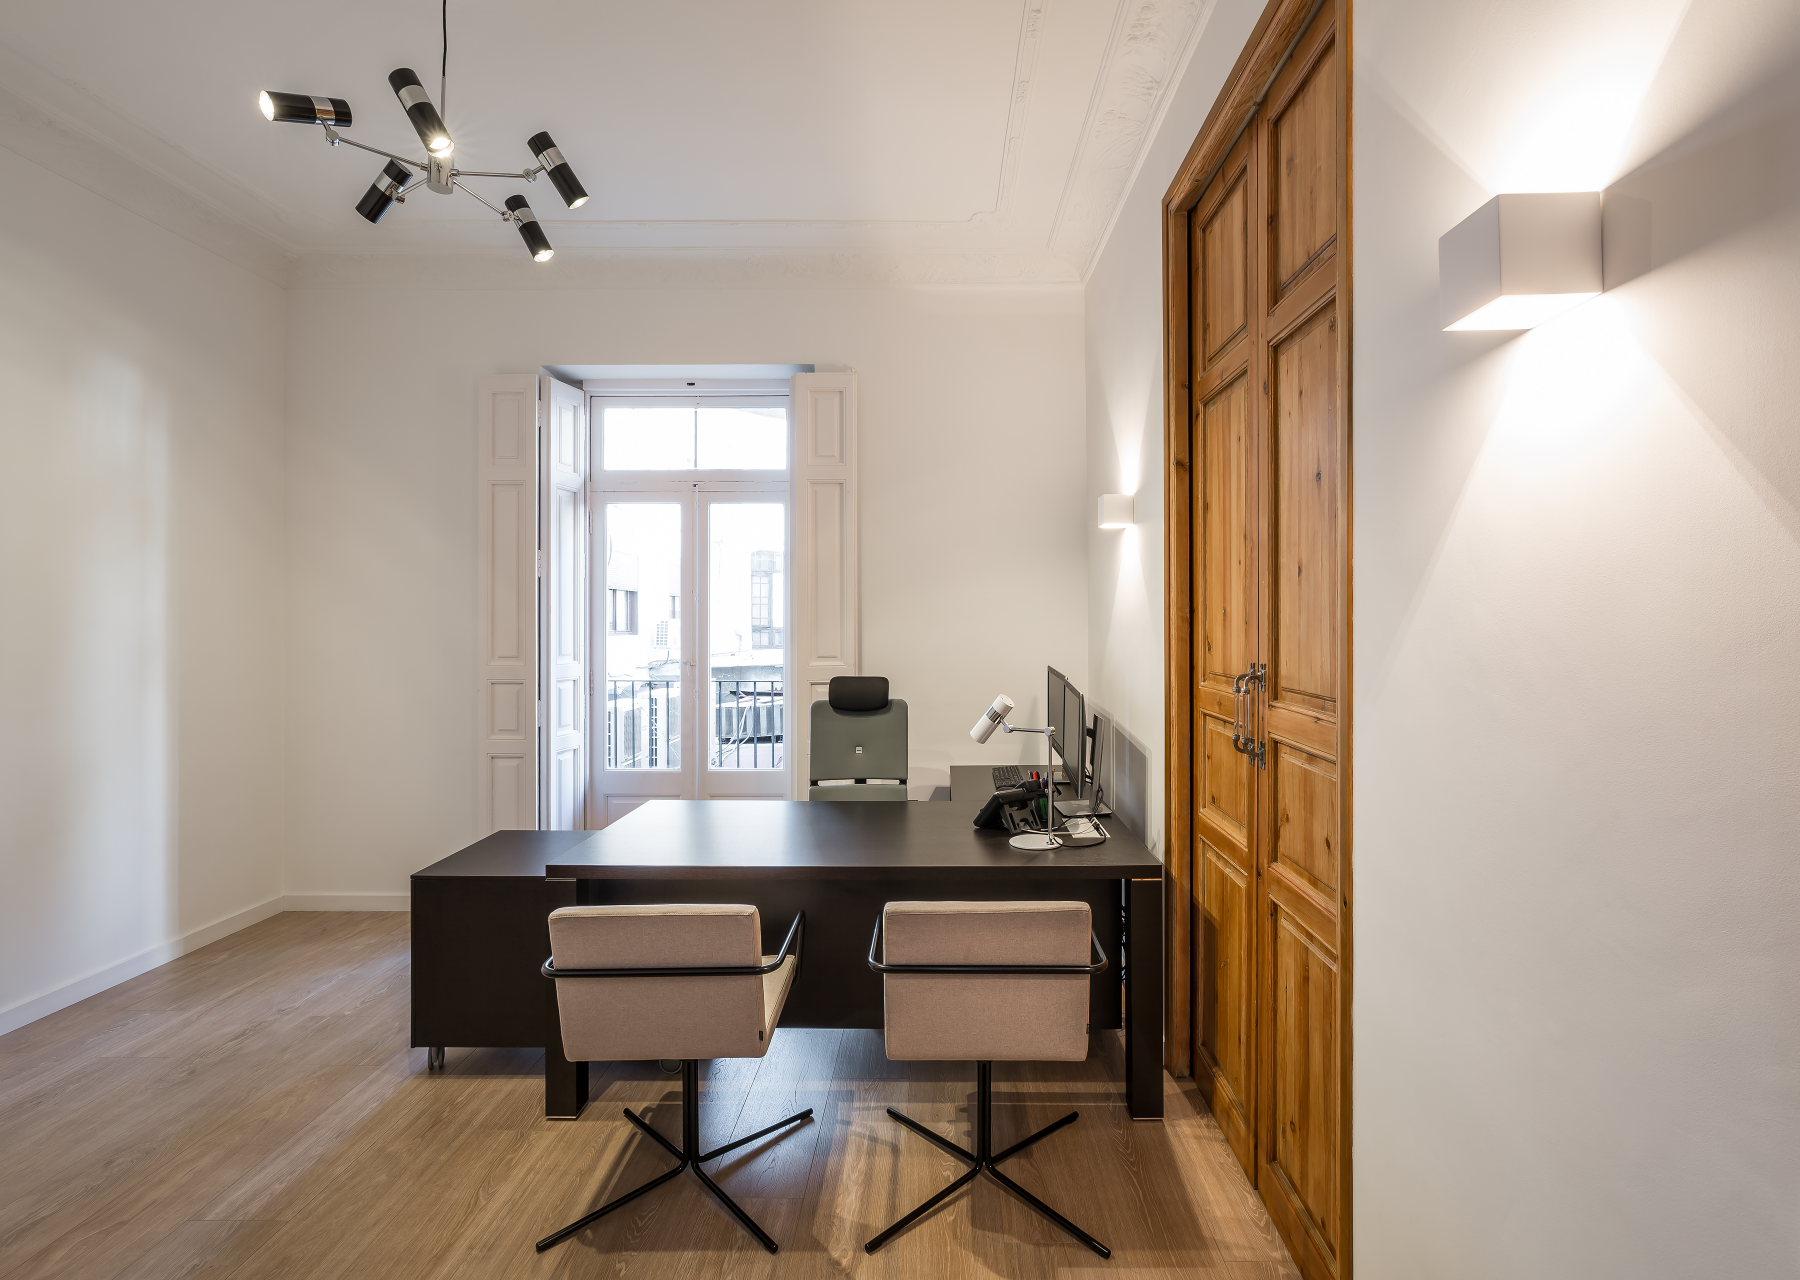 fotografia-arquitectura-valencia-german-cabo-d'estudio-despacho-oficinas-anaford-abogados (5)